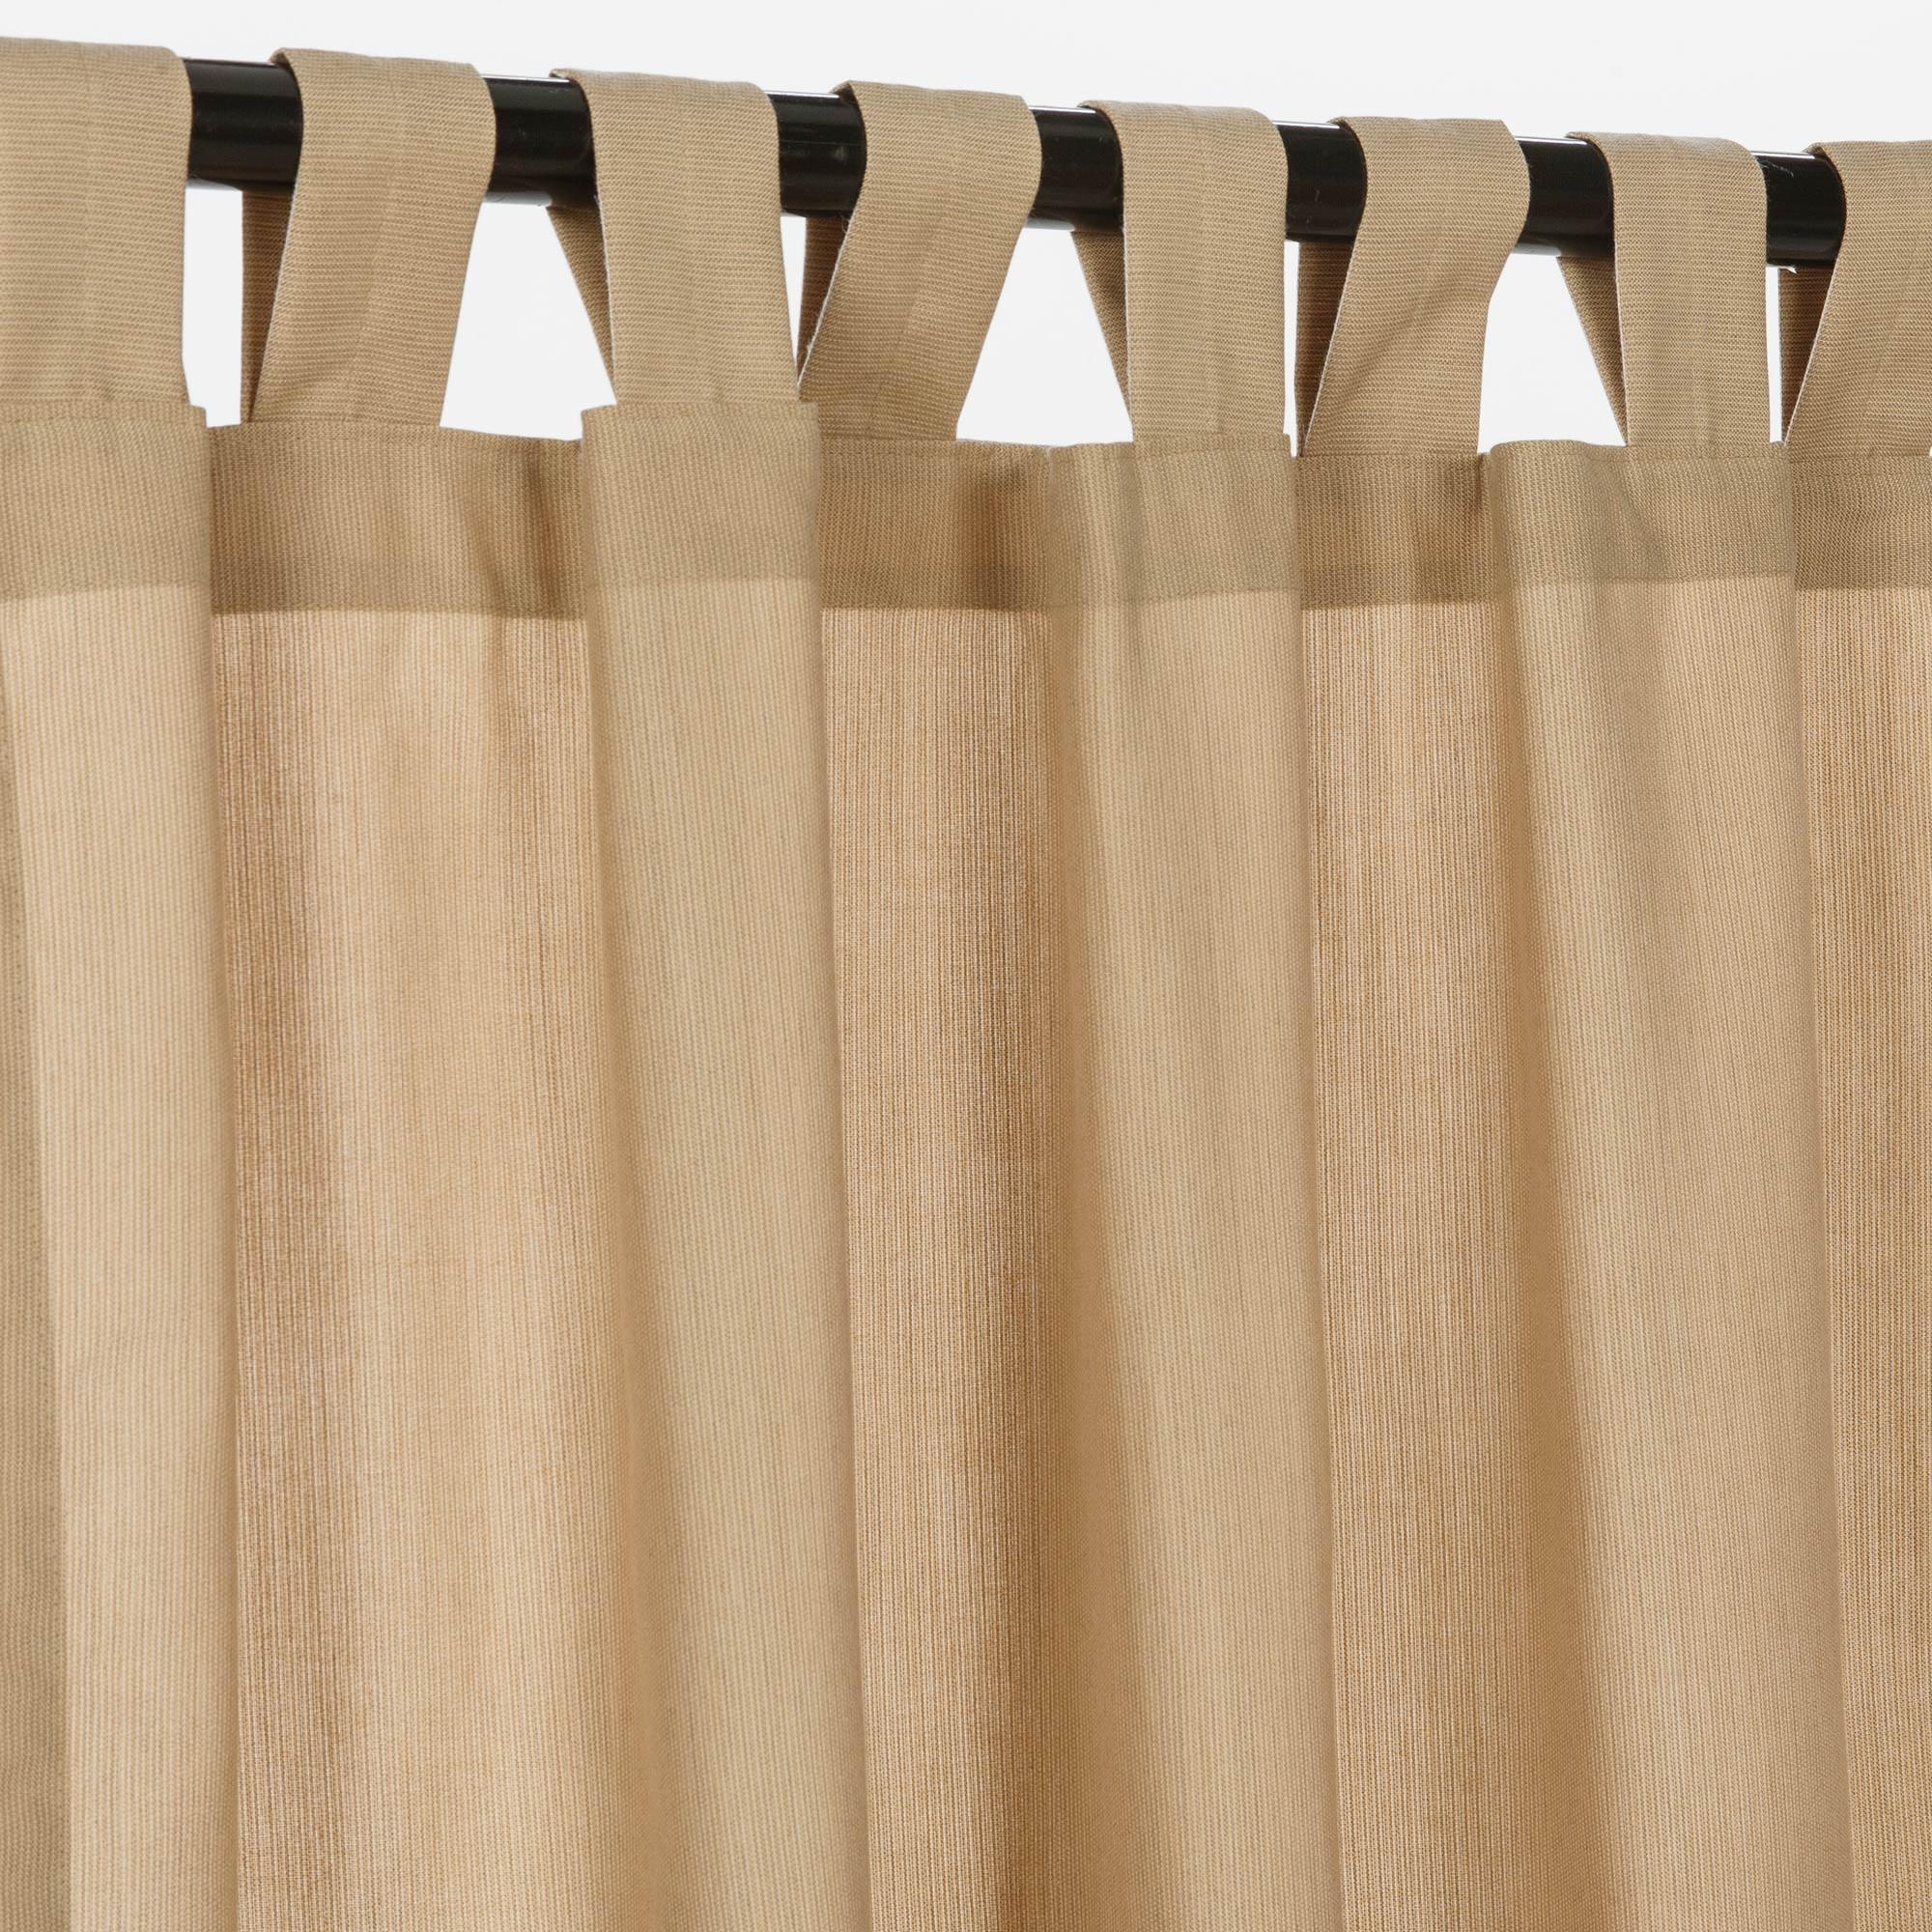 Spectrum Sand Tabbed Sunbrella Outdoor Curtains